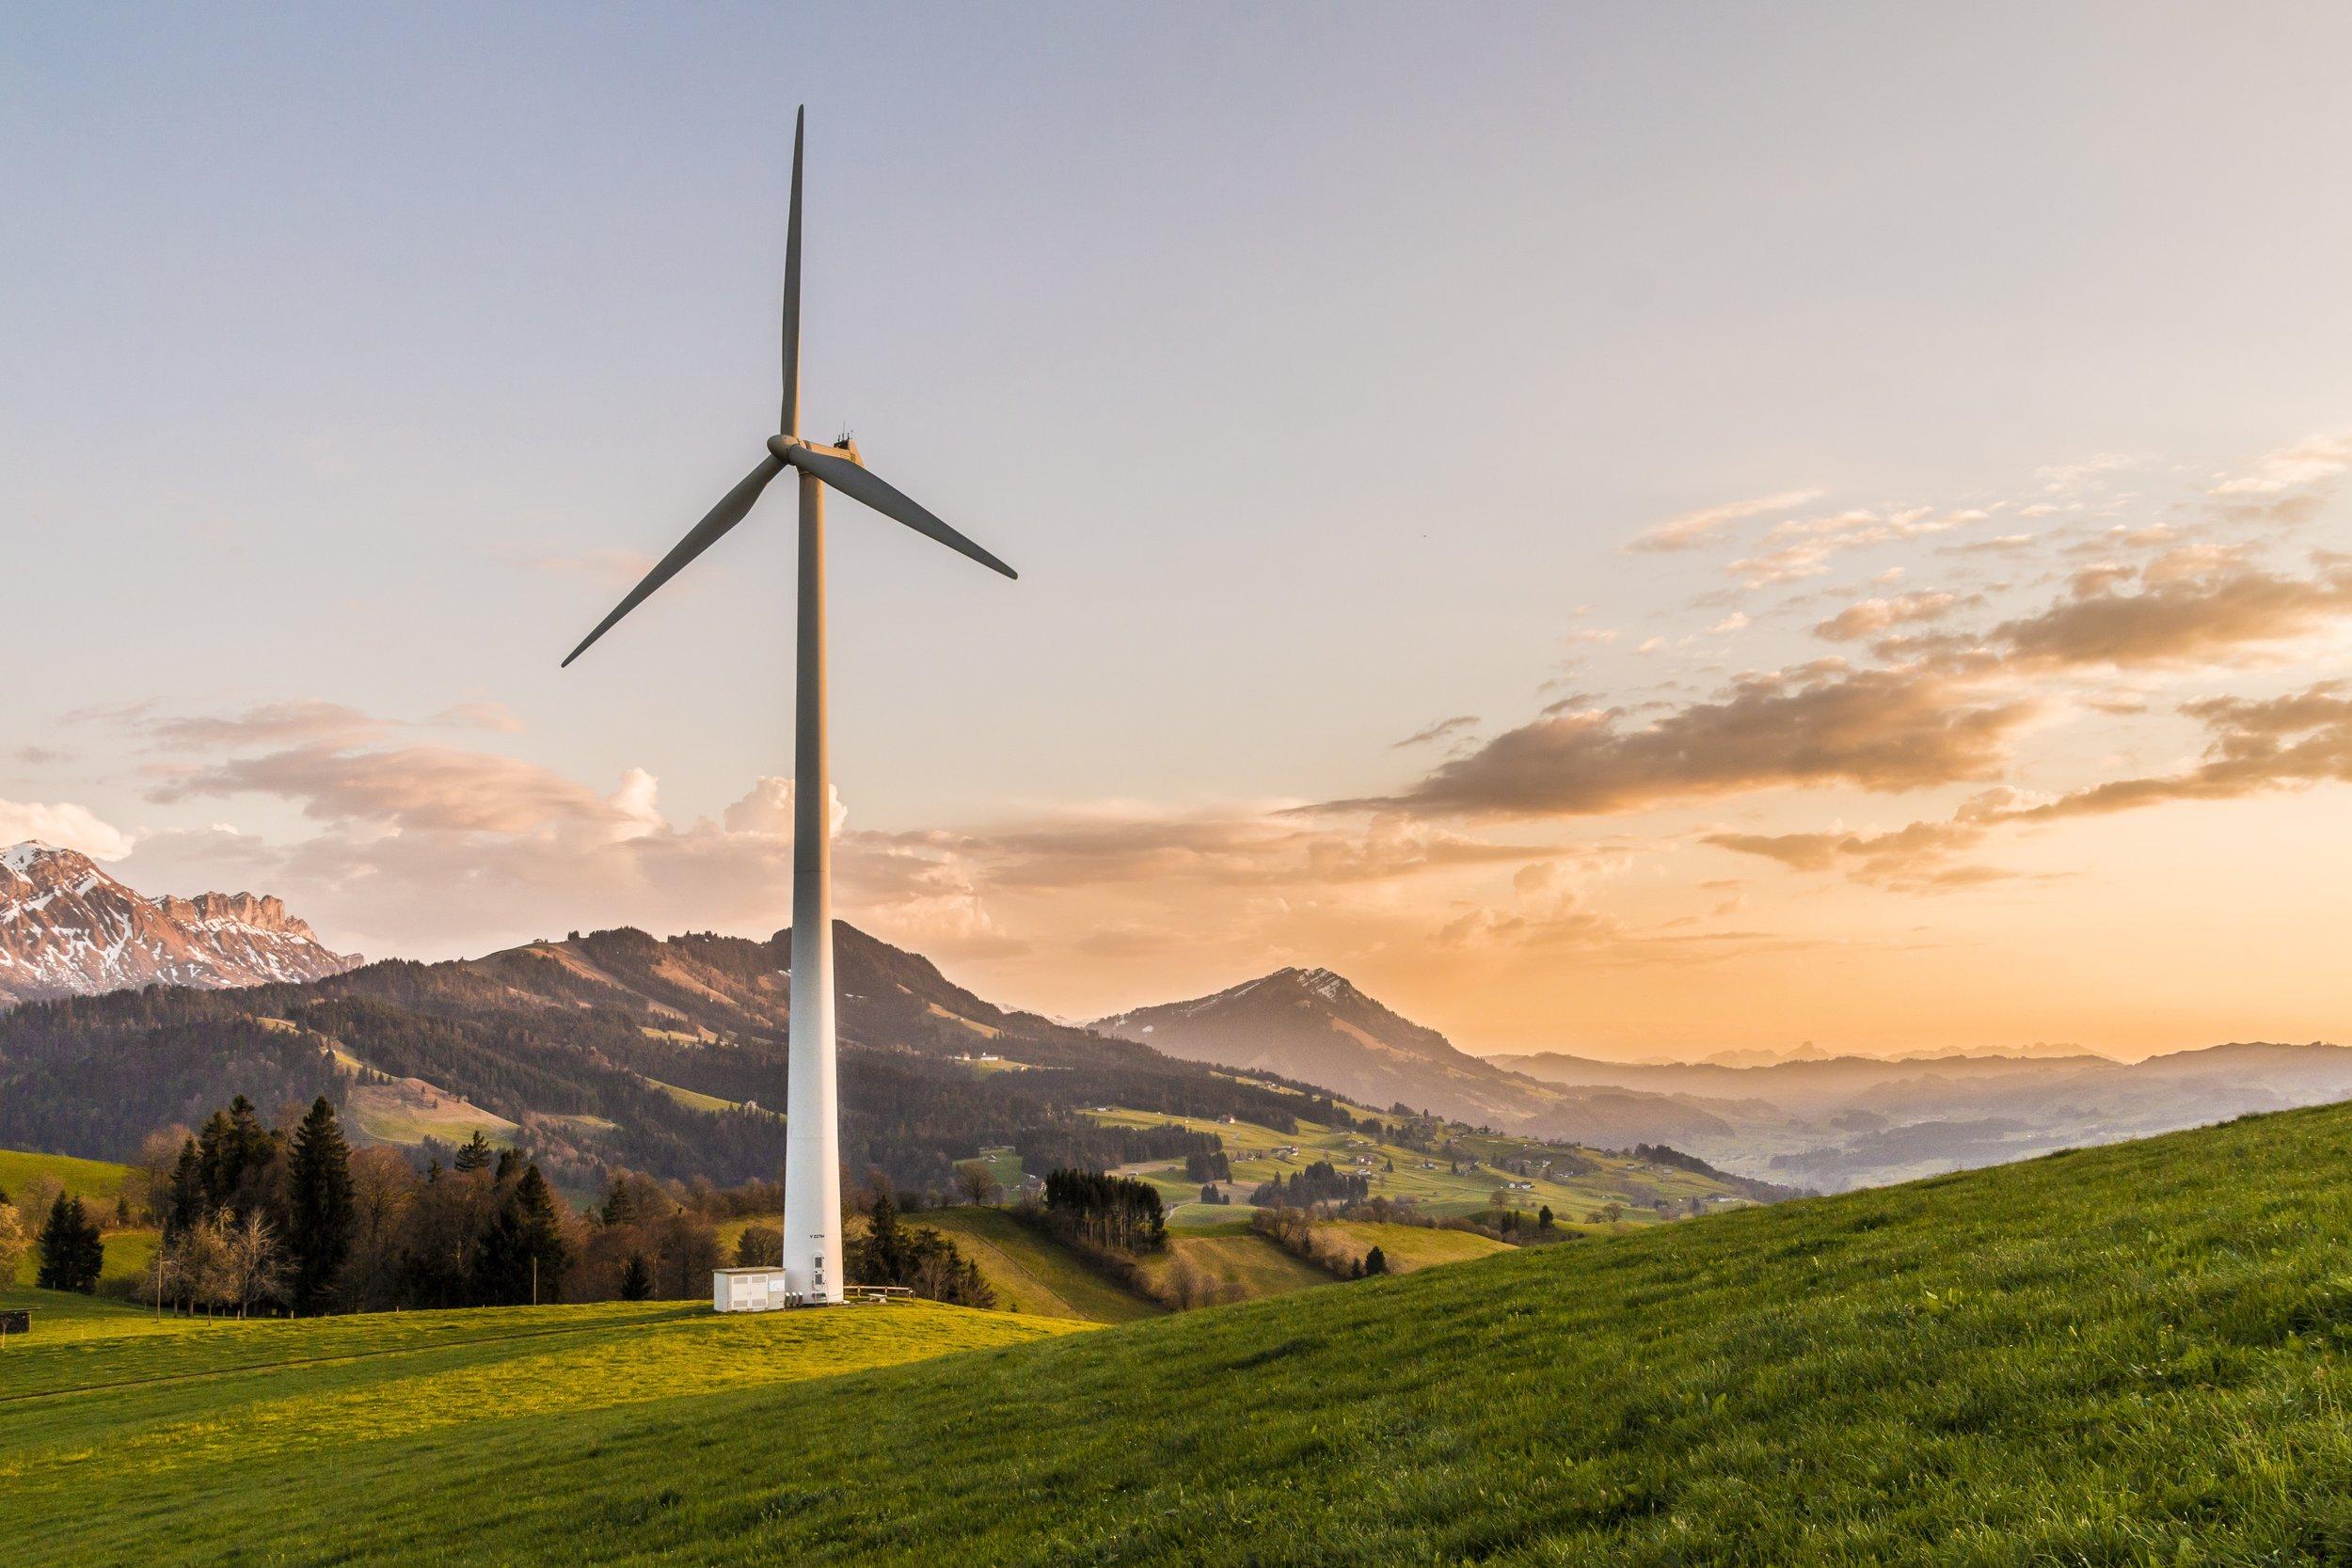 Wind Turbine Renewable Energy Wallet.Services DLT